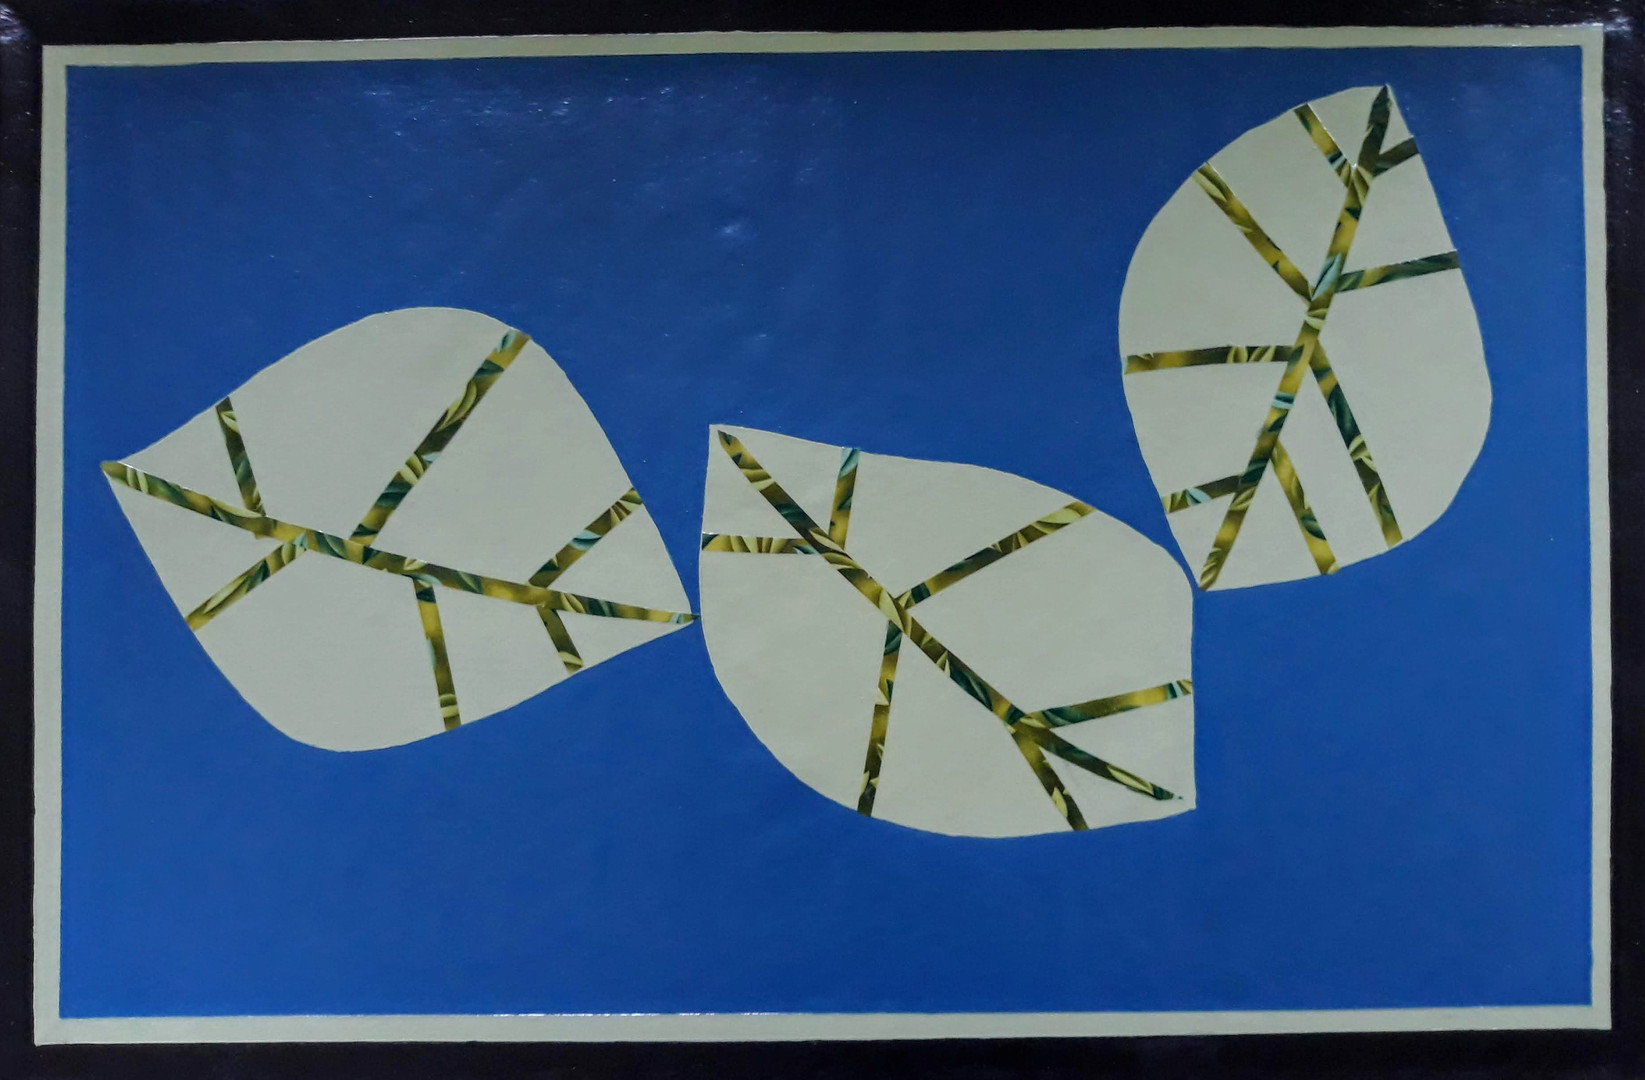 Segmented Leaves